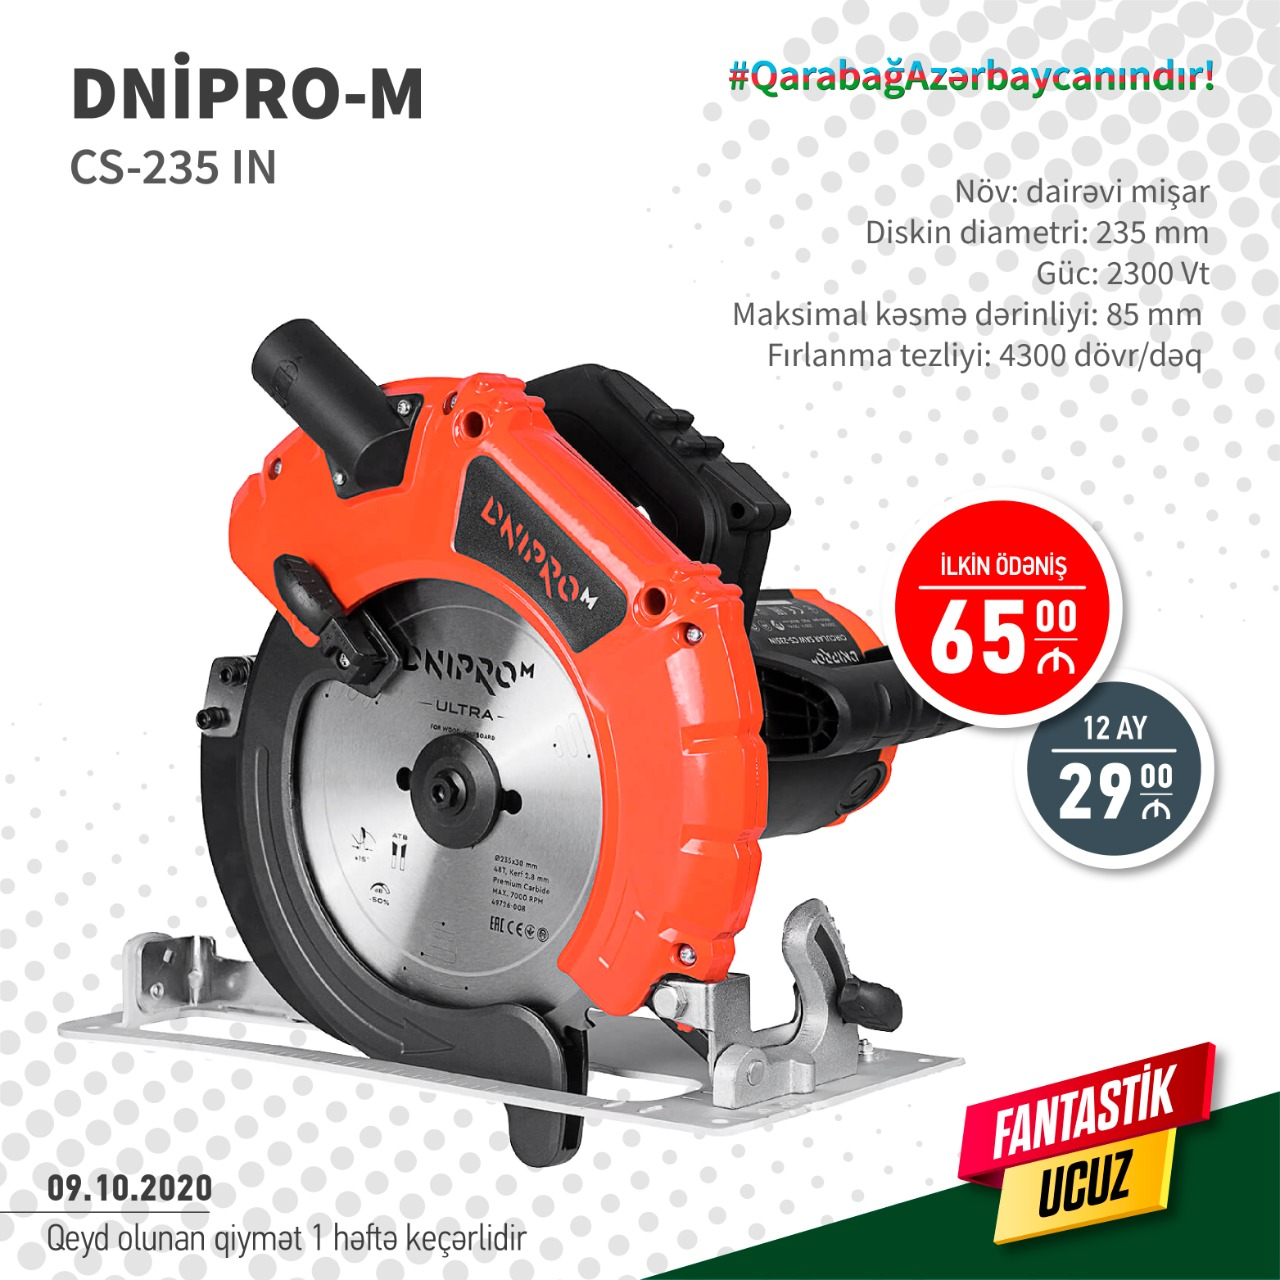 Növ: Dairəvi Mişar Diskin diametri: 235 mm Güc: 2300 Vt